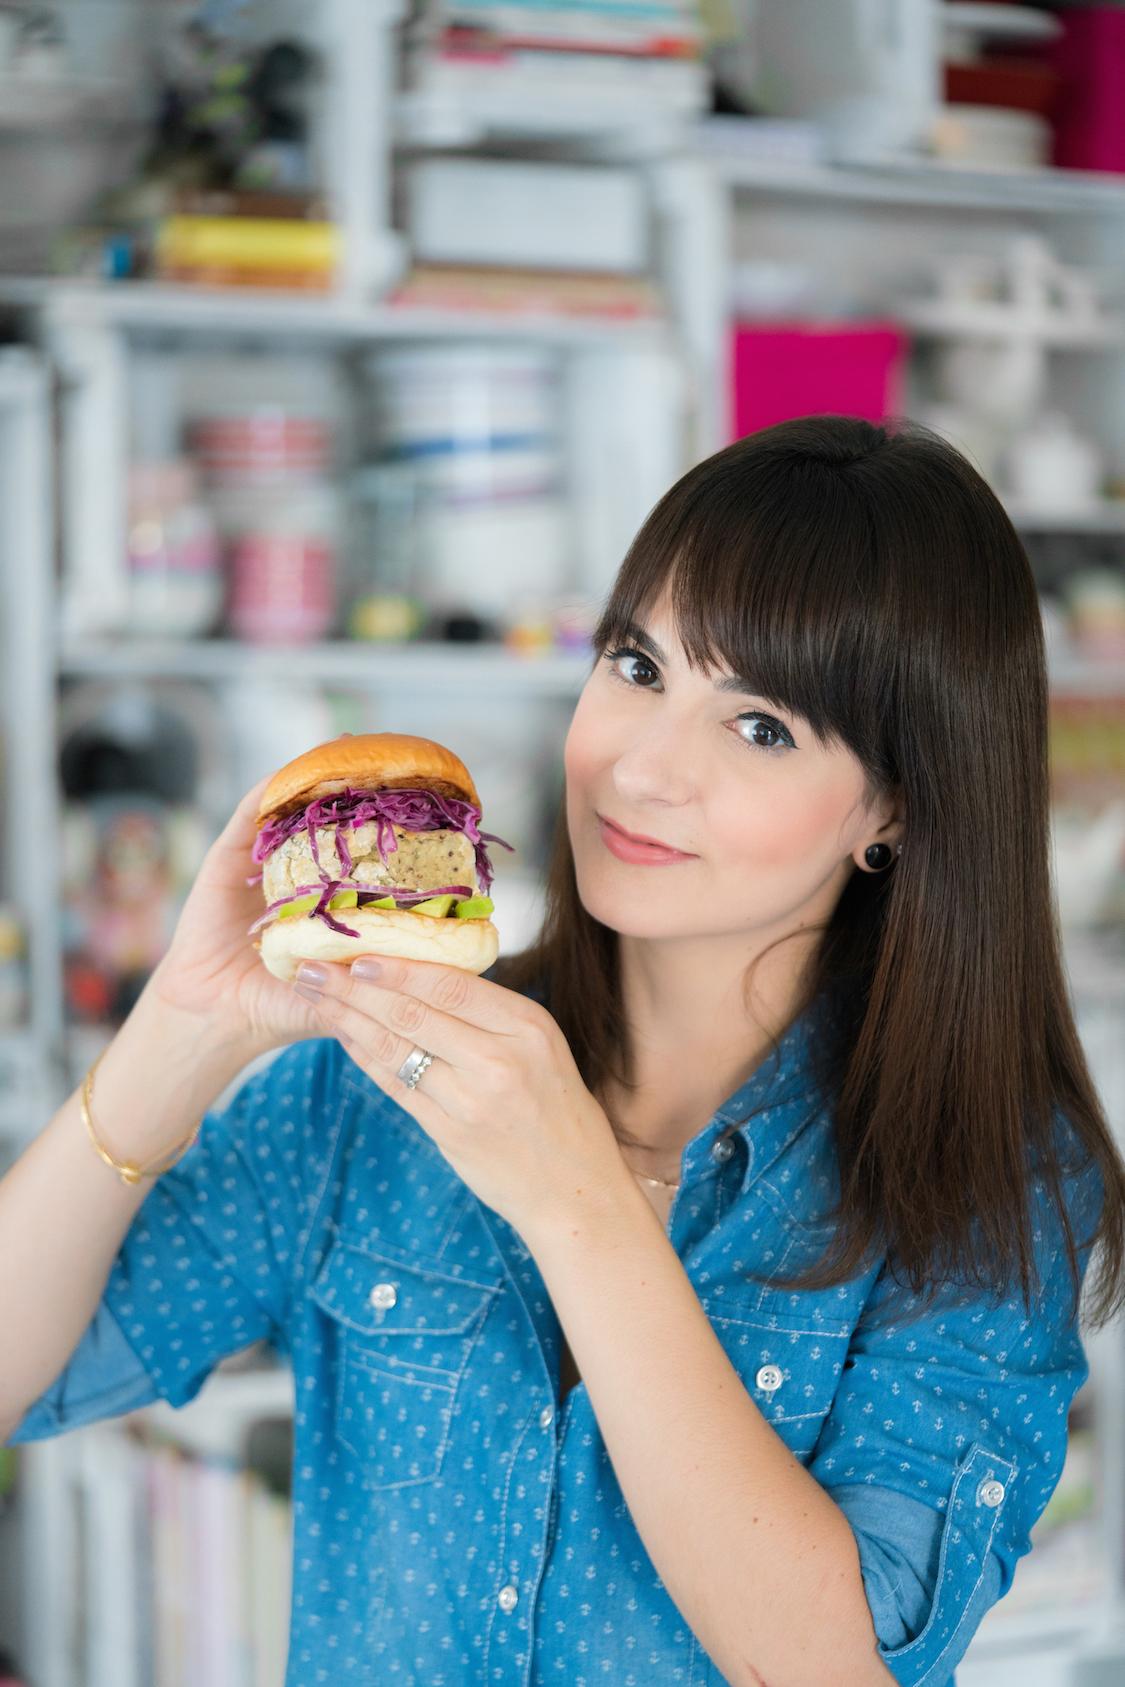 receita-hamburguer-vegetariano-dani-noce-fit-3